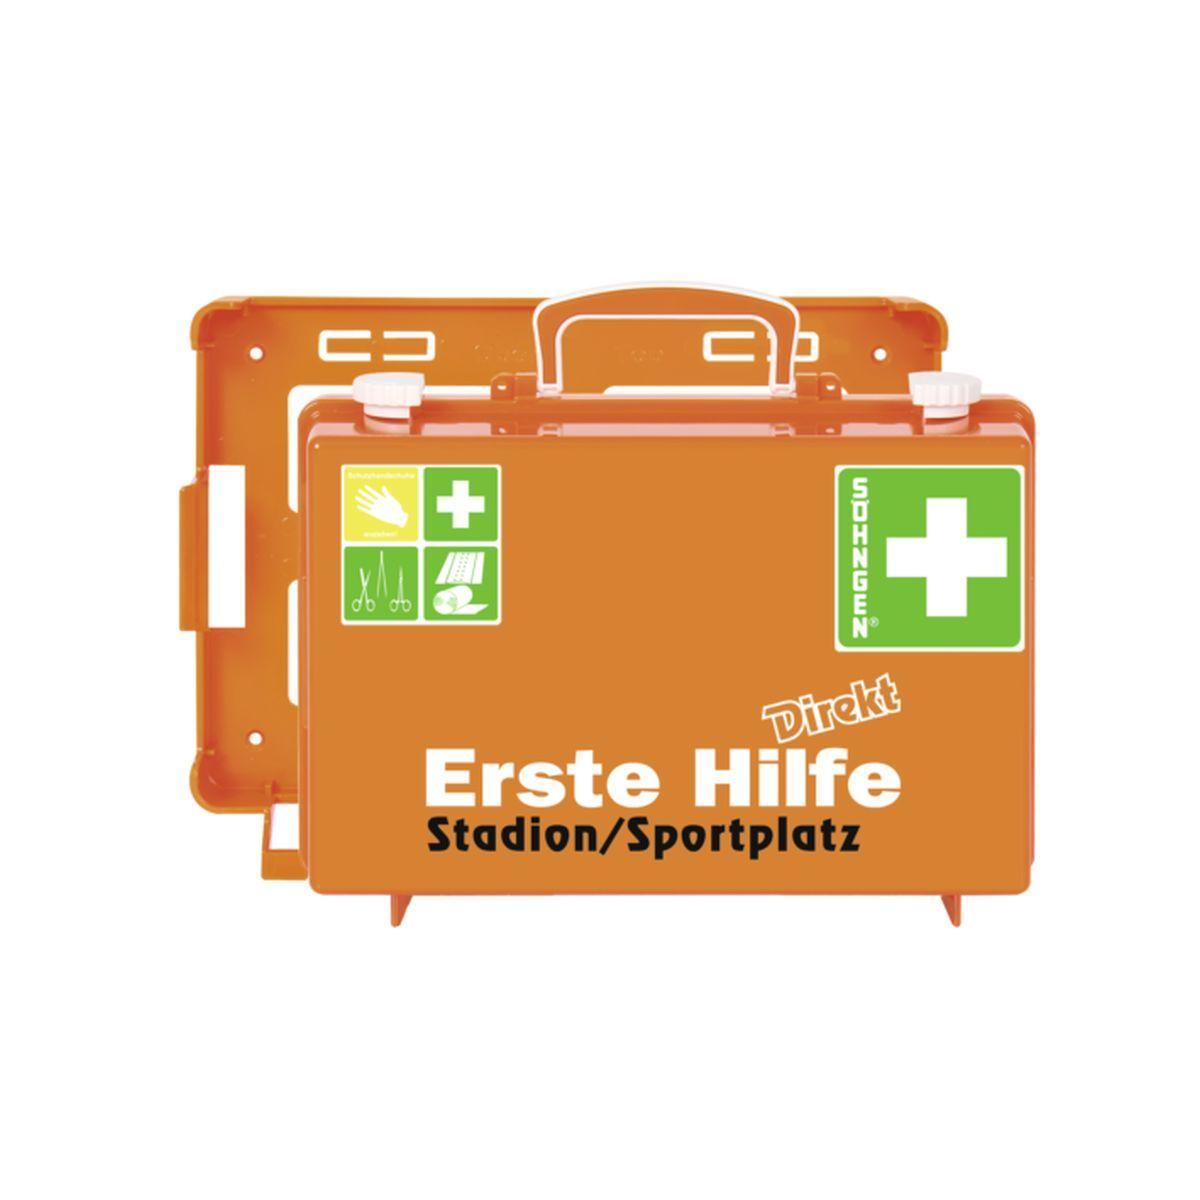 Erste Hilfe Koffer DIN 13157 DIREKT, Stadion/Sportplatz